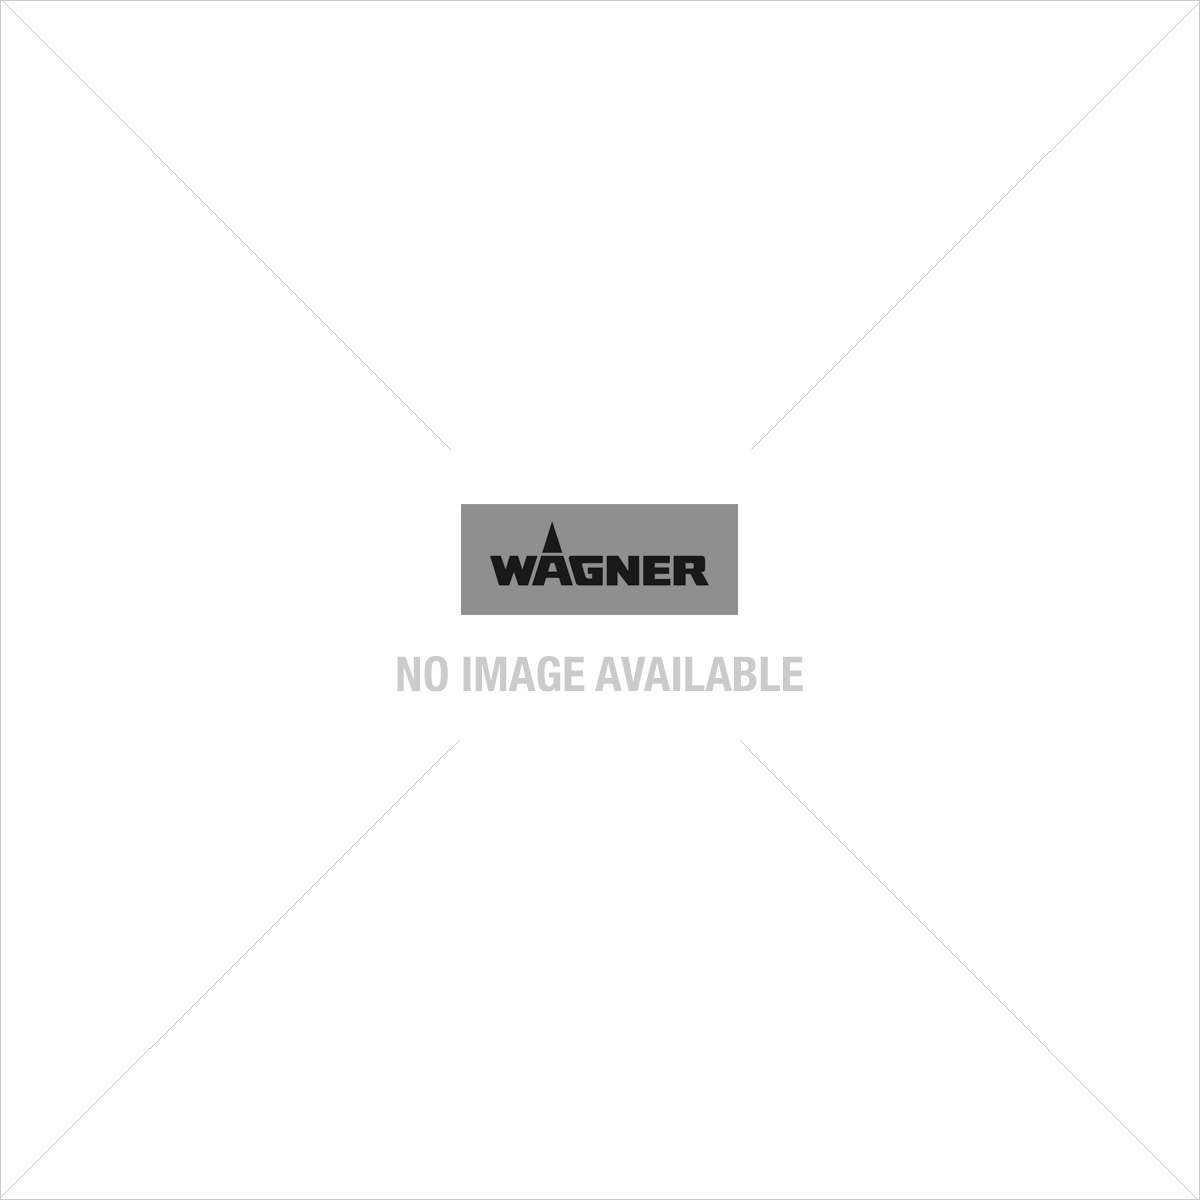 Wagner SprühpistolePP-05mit Drehgelenk